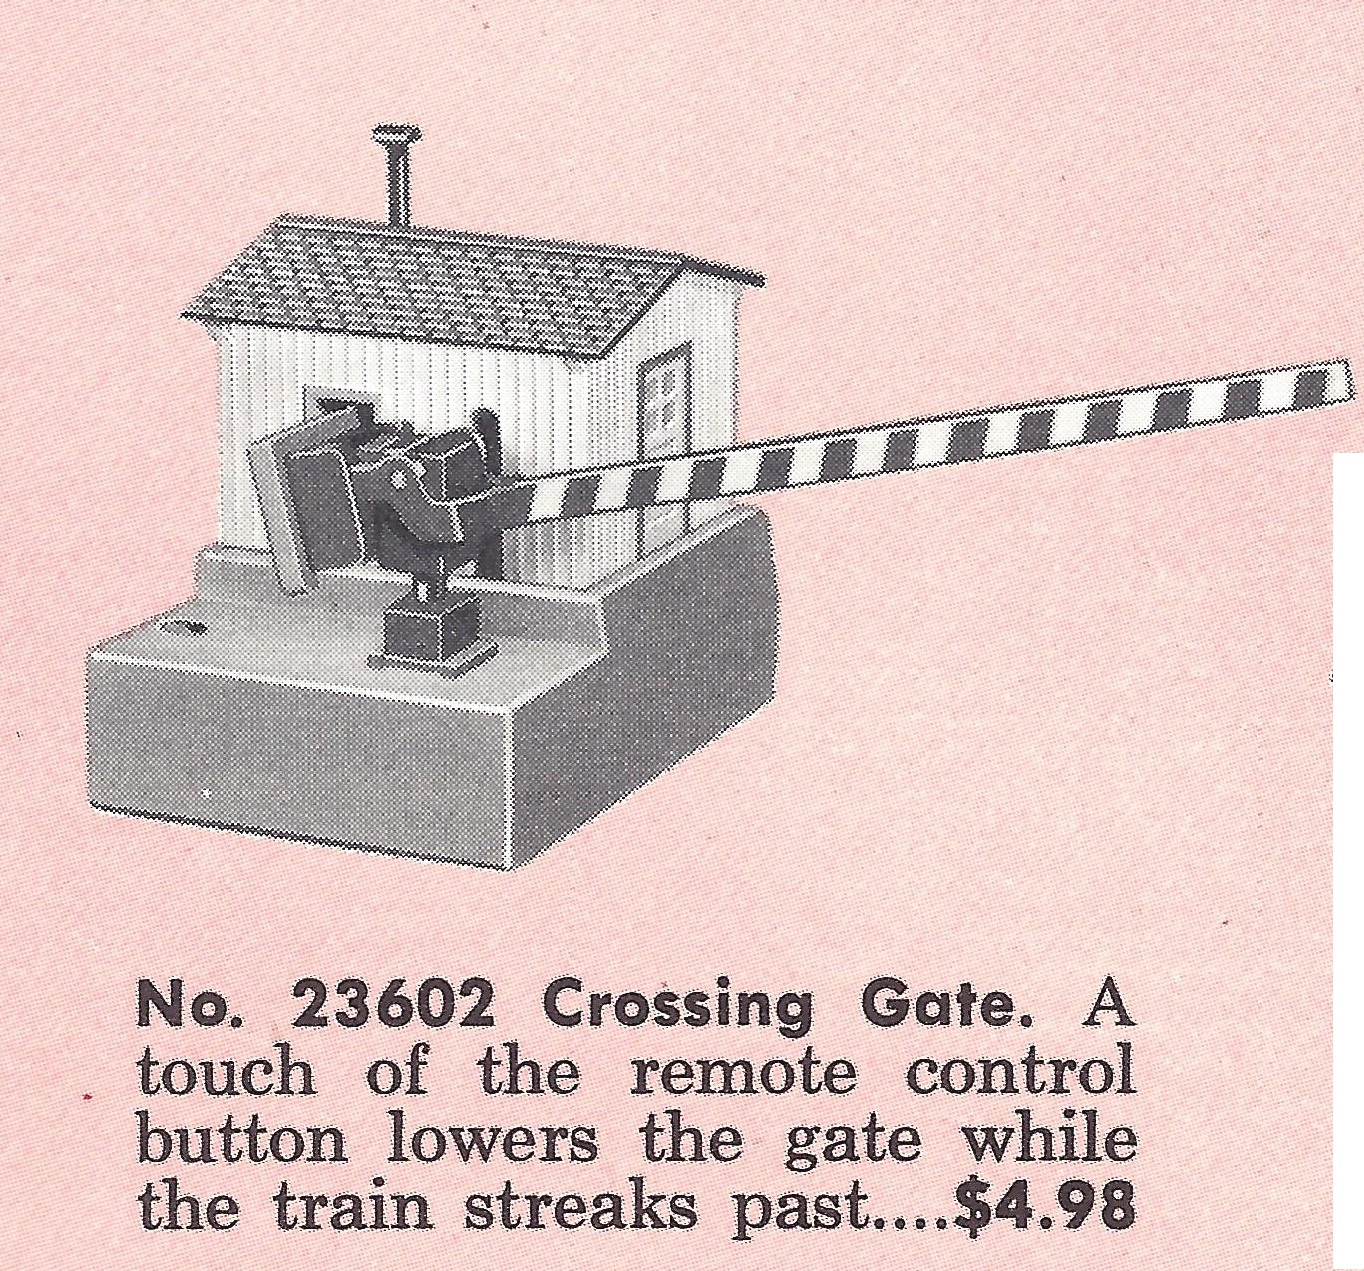 American Flyer Crossing Gate 23602